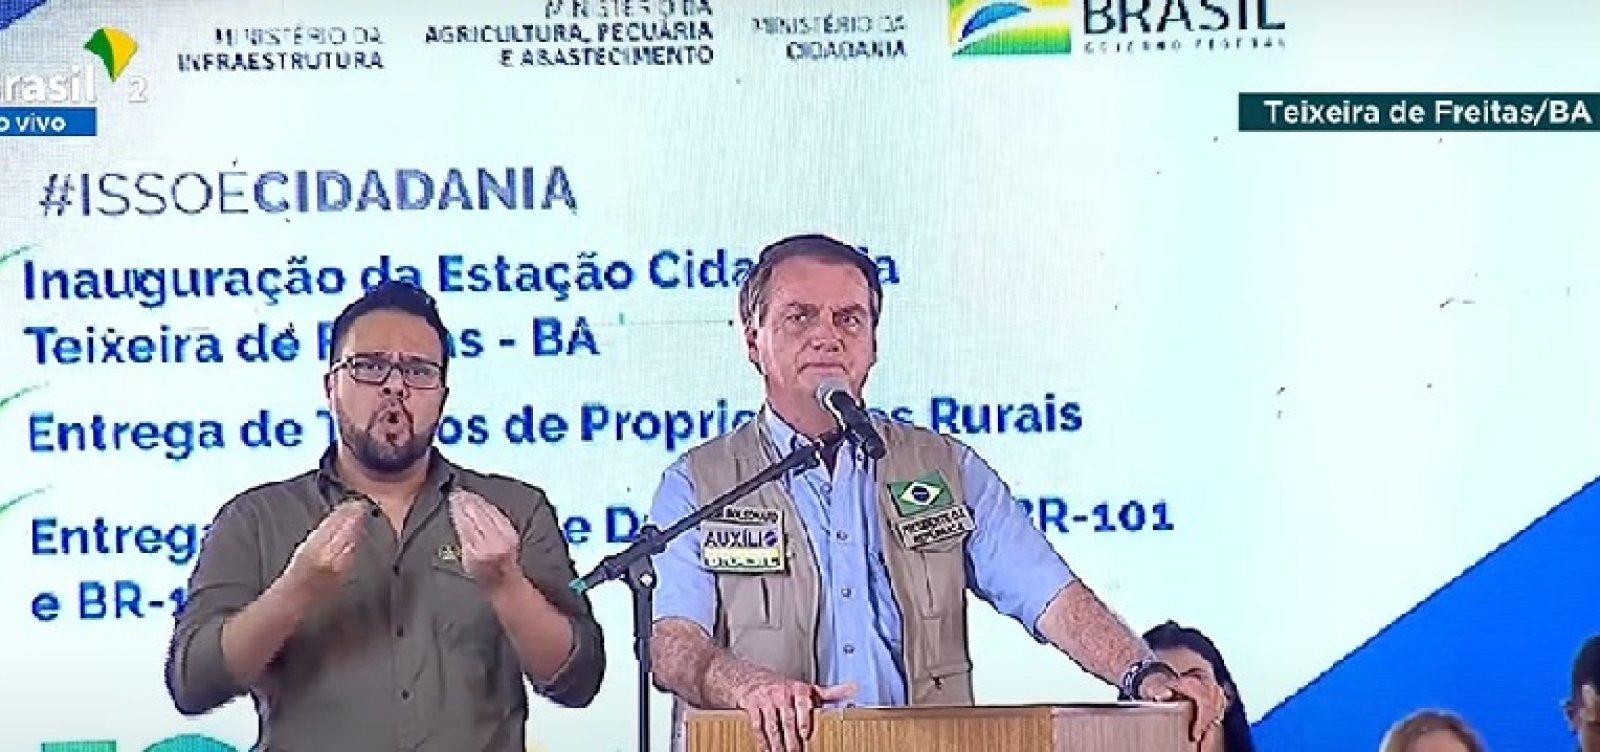 Na Bahia, Bolsonaro volta a atacar governadores e faz discurso exaltando auxílio emergencial